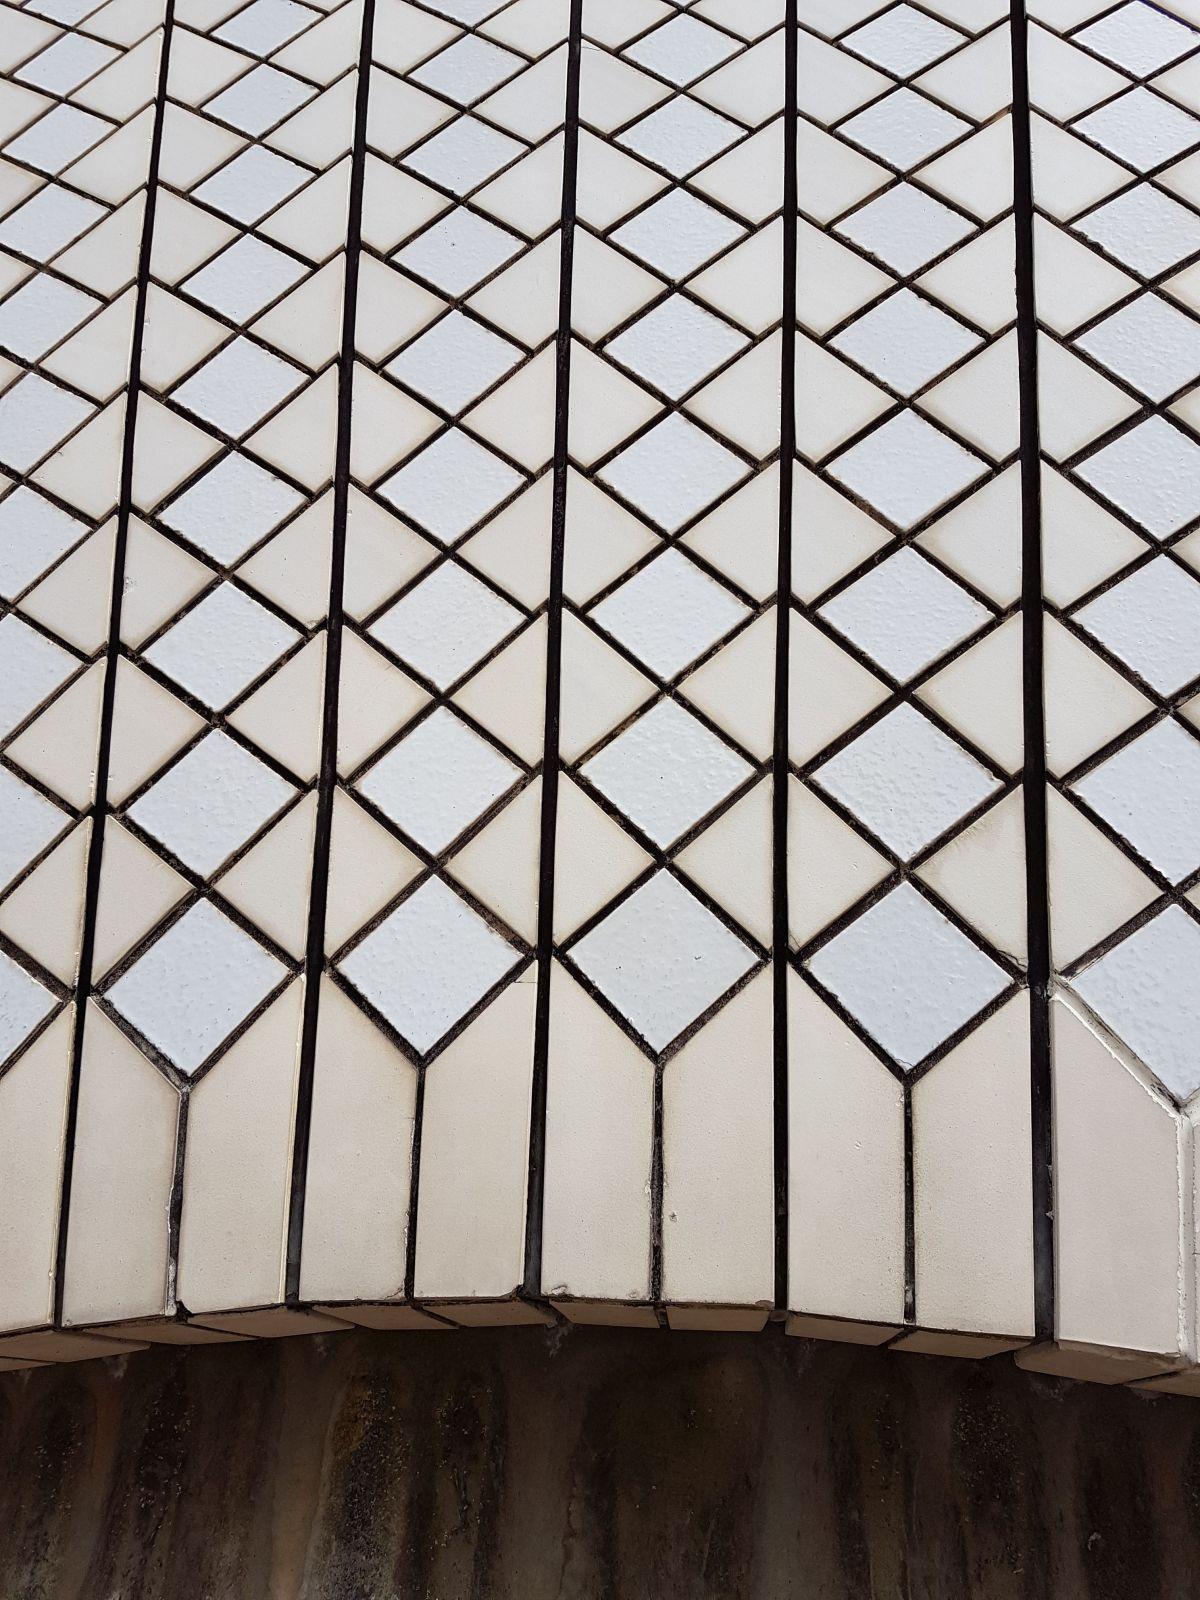 sydney opera house tile